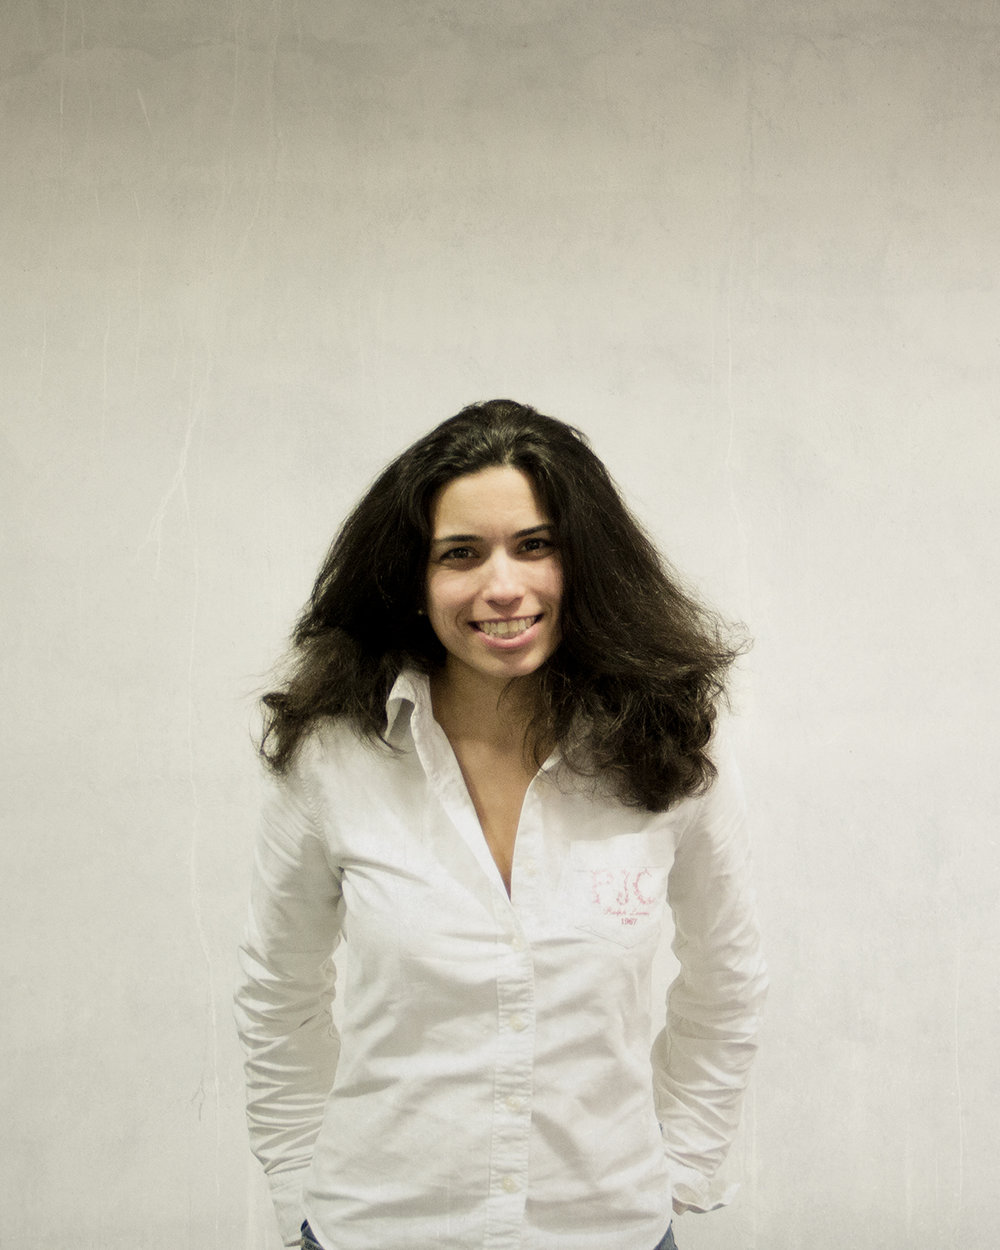 ALINA EMIN  Senior Product Manager  T: +43 1 318 55 22-220 F: +43 1 318 55 22-900 E:  alina.emin@multigate.at